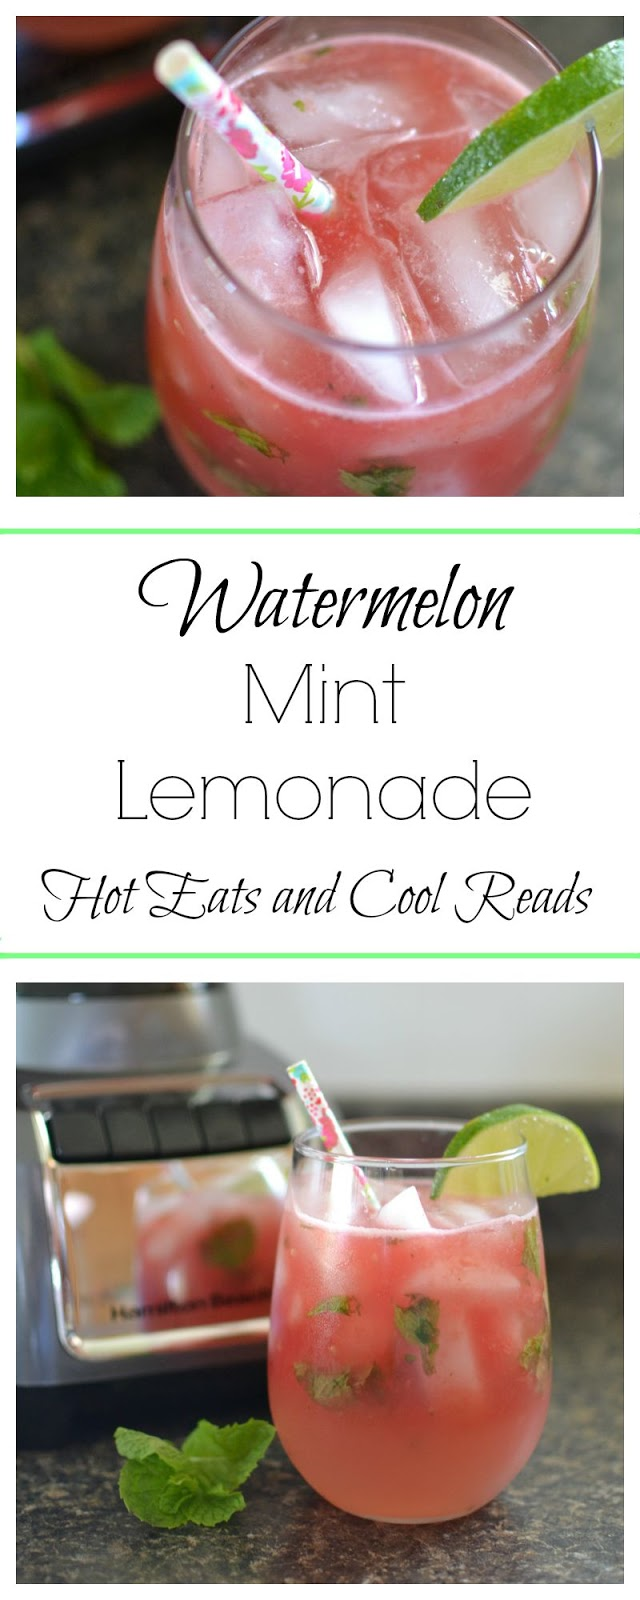 ... Eats and Cool Reads: Watermelon Mint Lemonade Recipe plus Giveaway